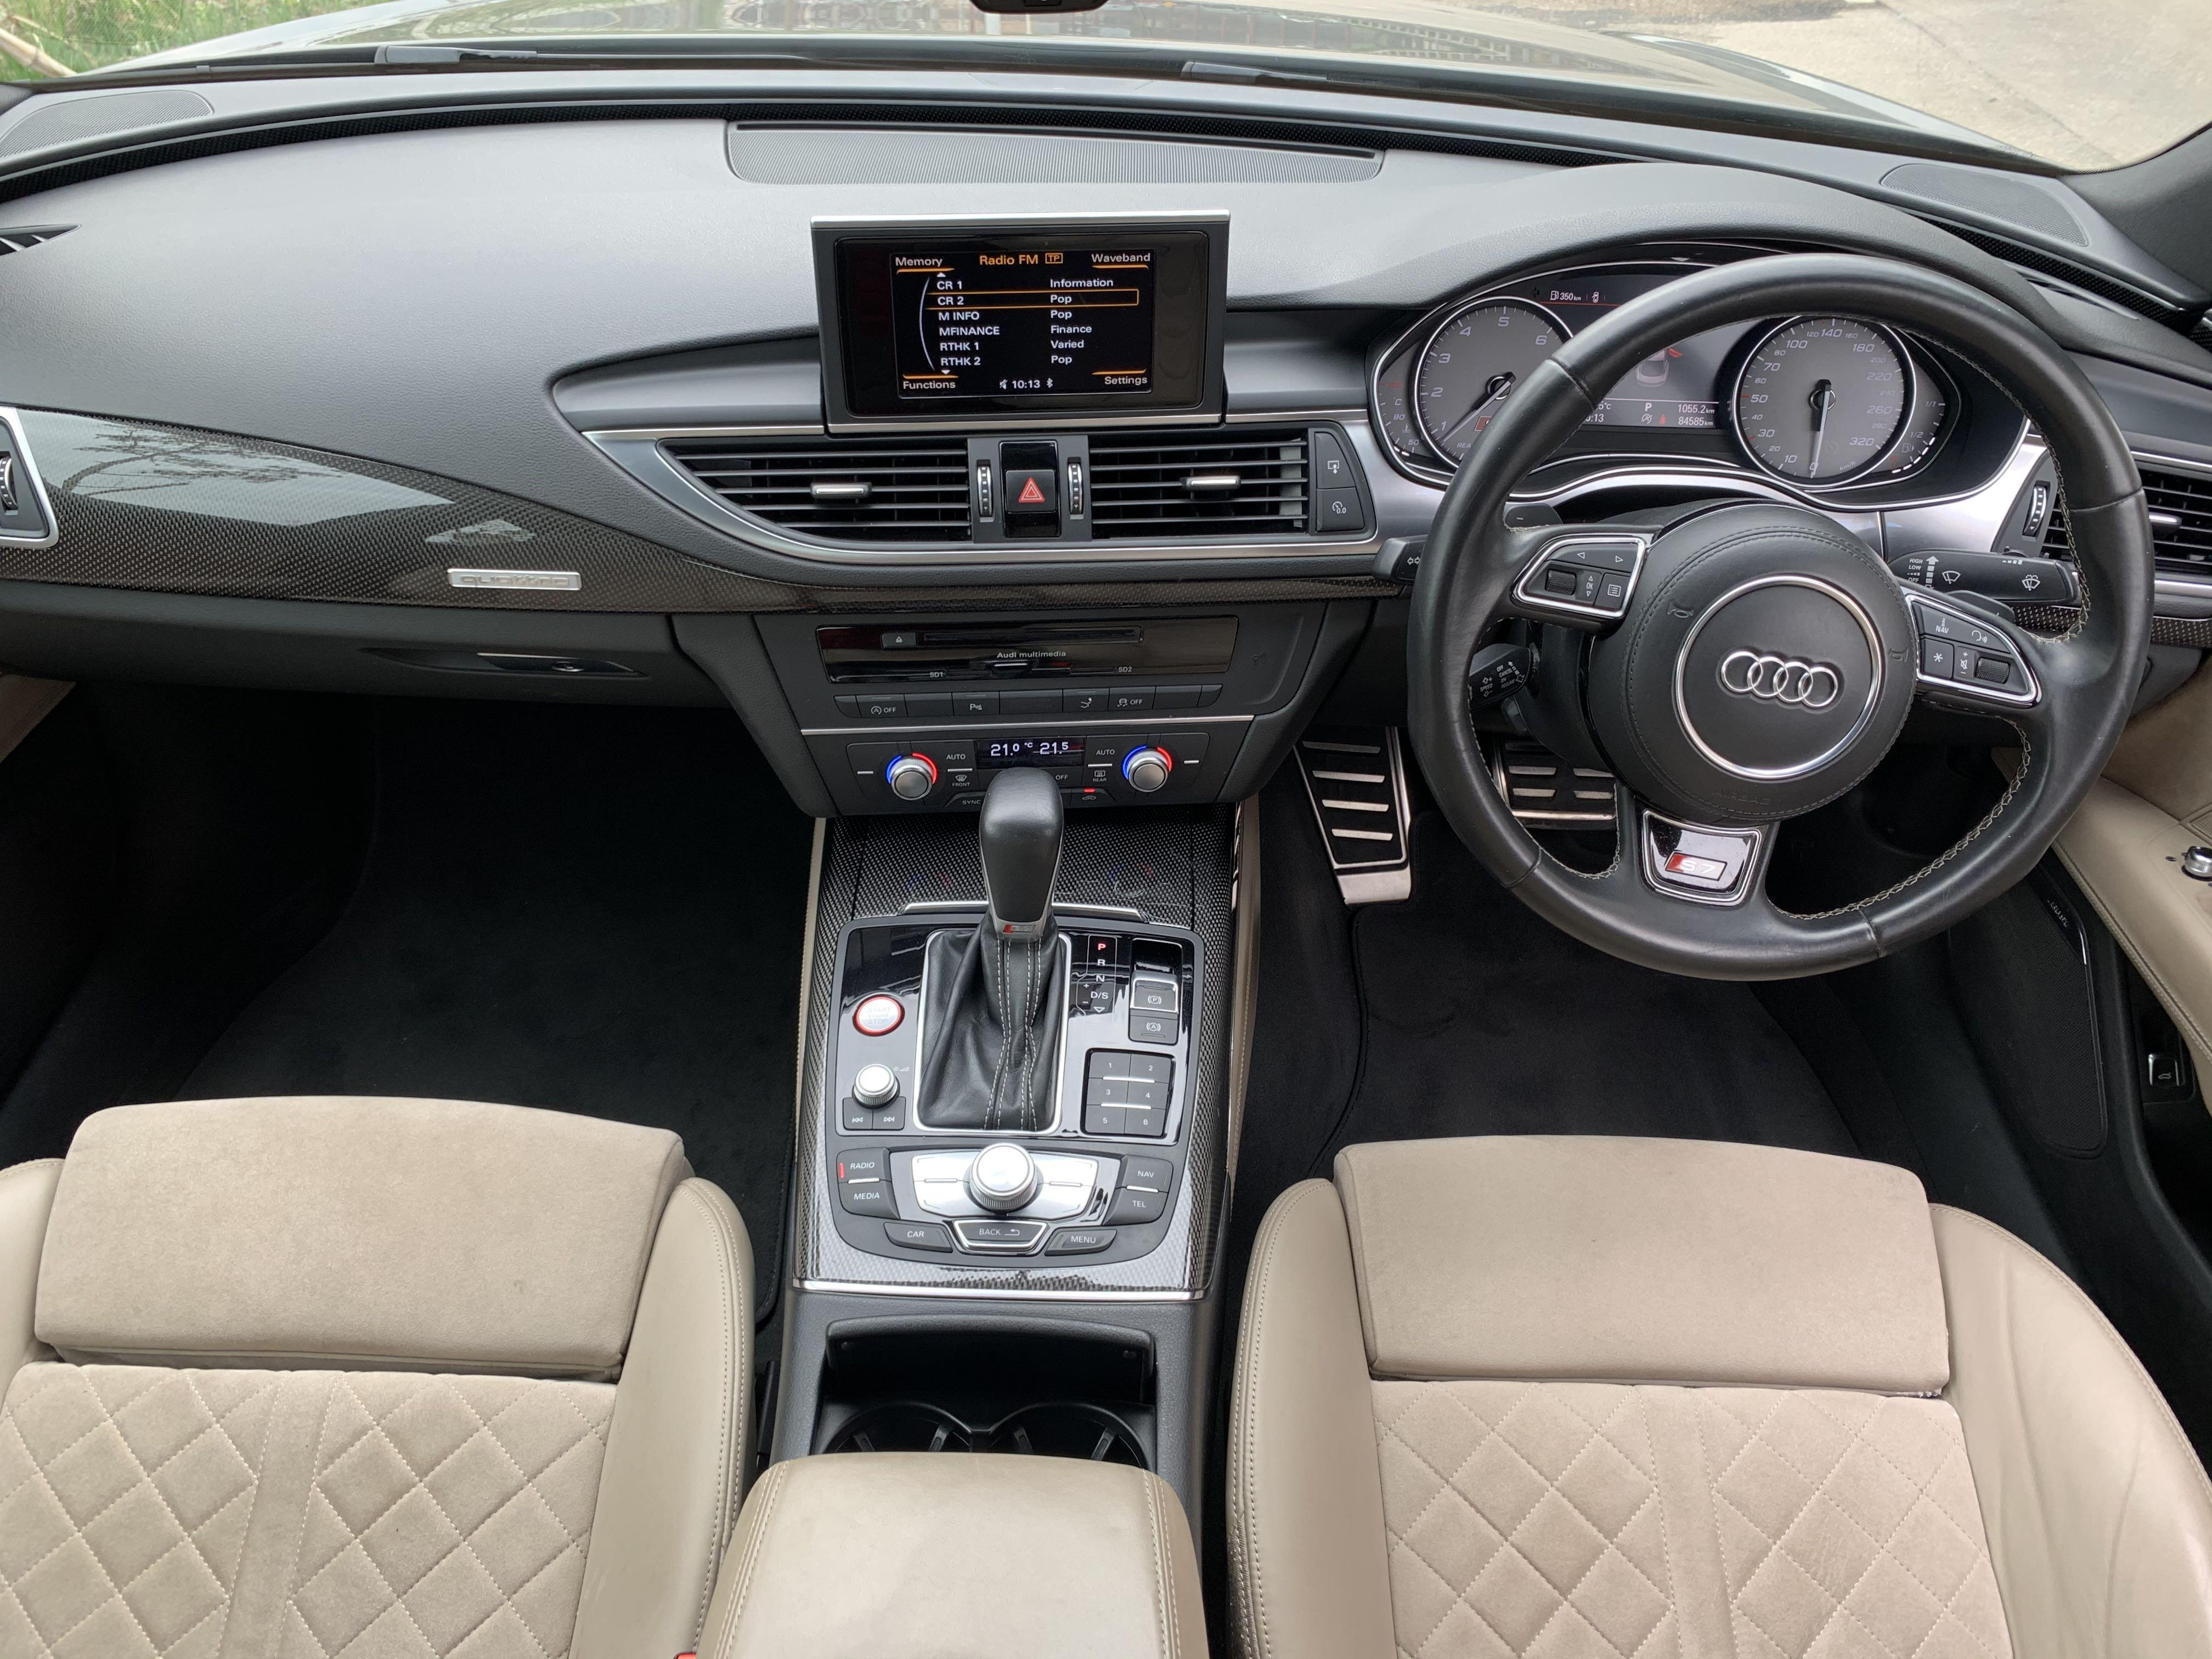 Audi S7 Sportback 4.0 TFSI quattro S tronic 5-Dr (A)